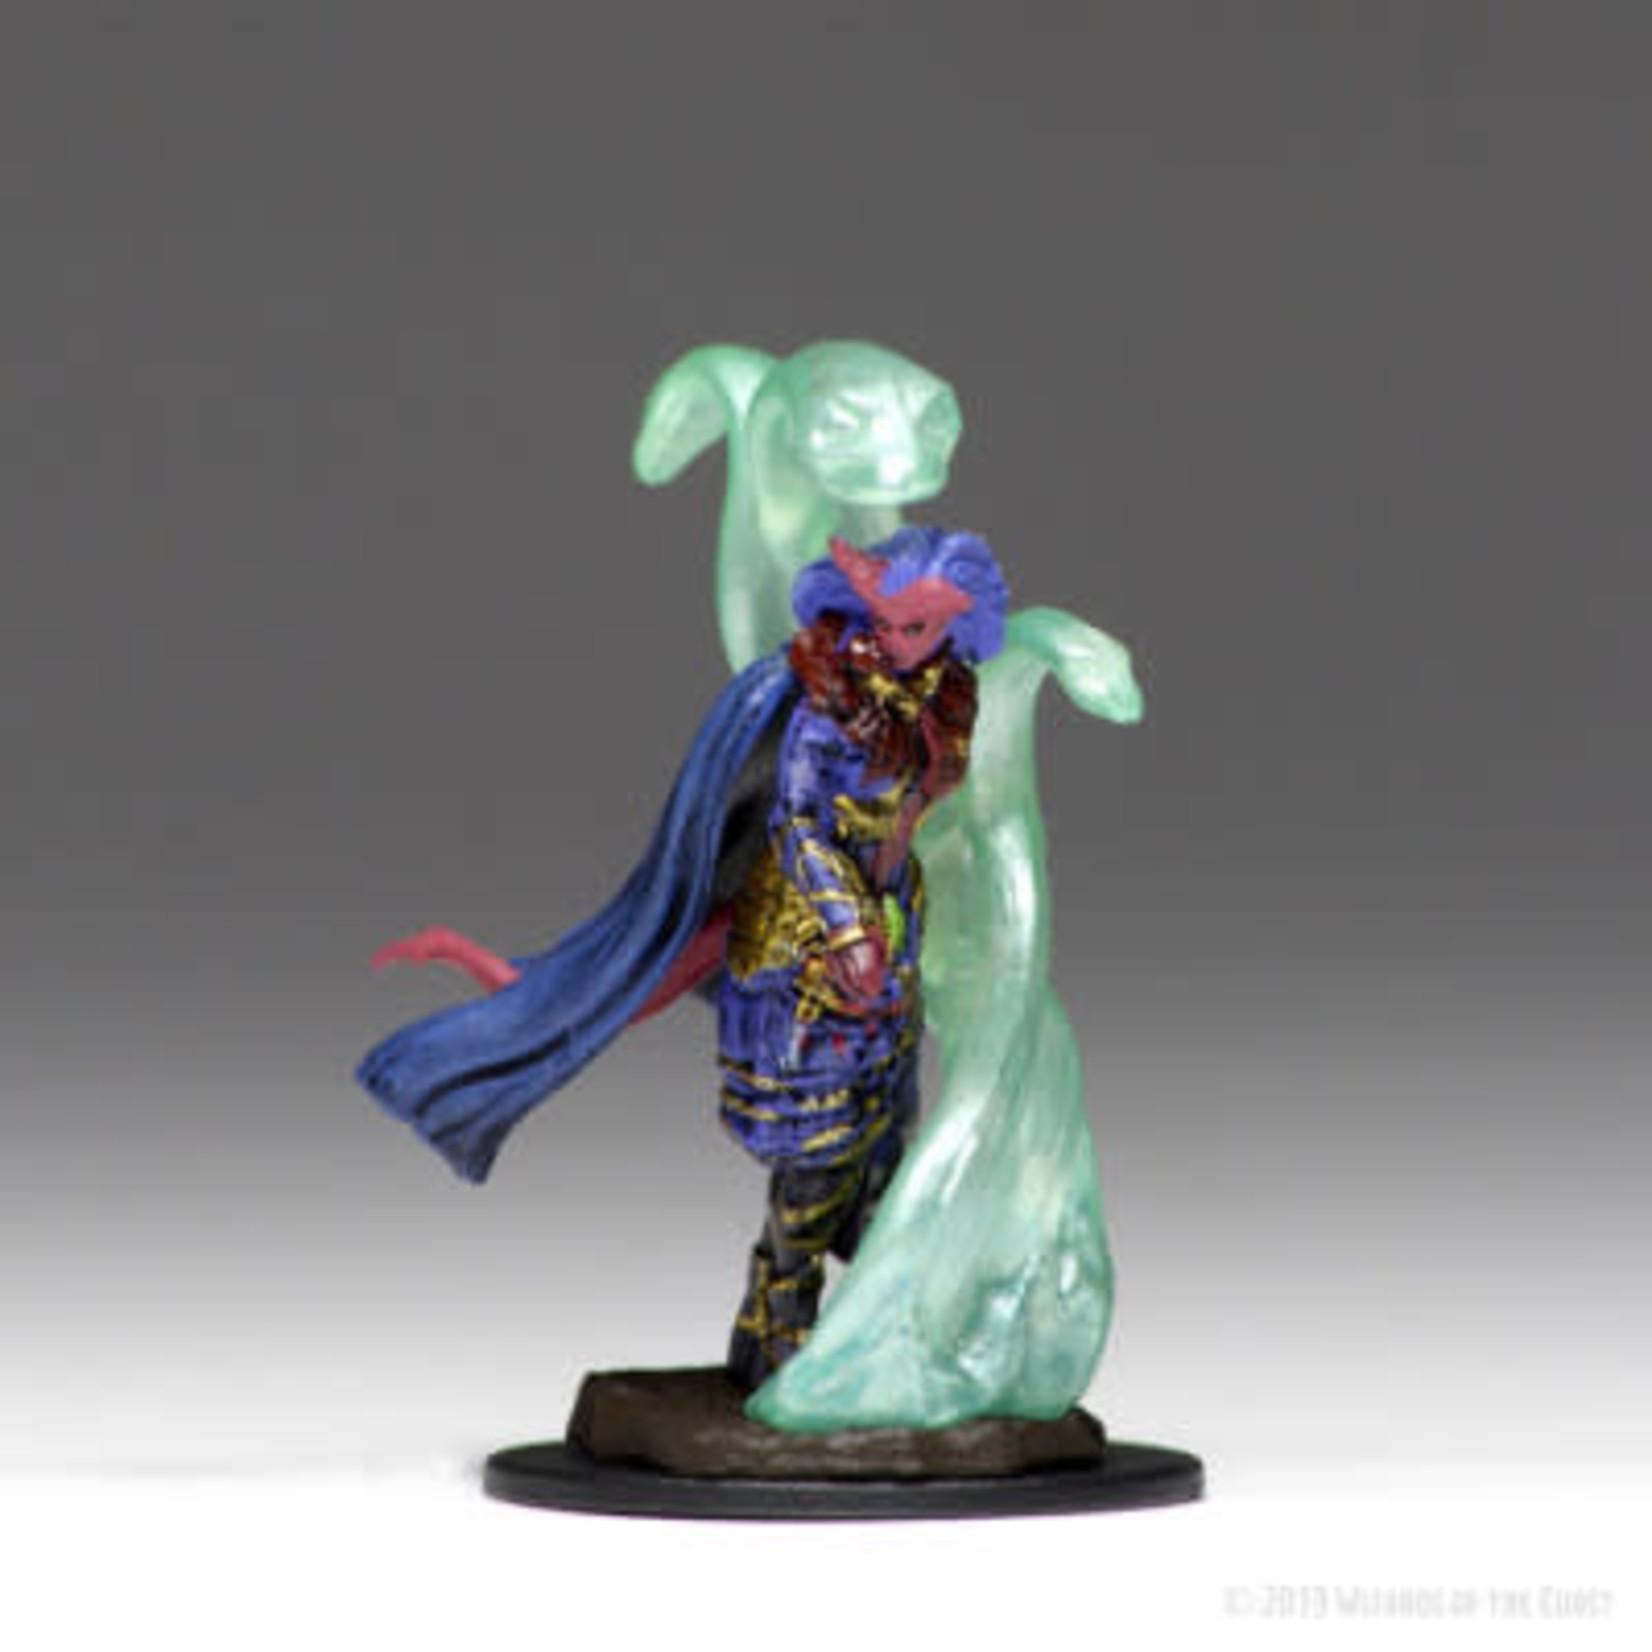 WizKids WizKids D&D Icons of the Realms Premium Figure: Tiefling Female Sorcerer